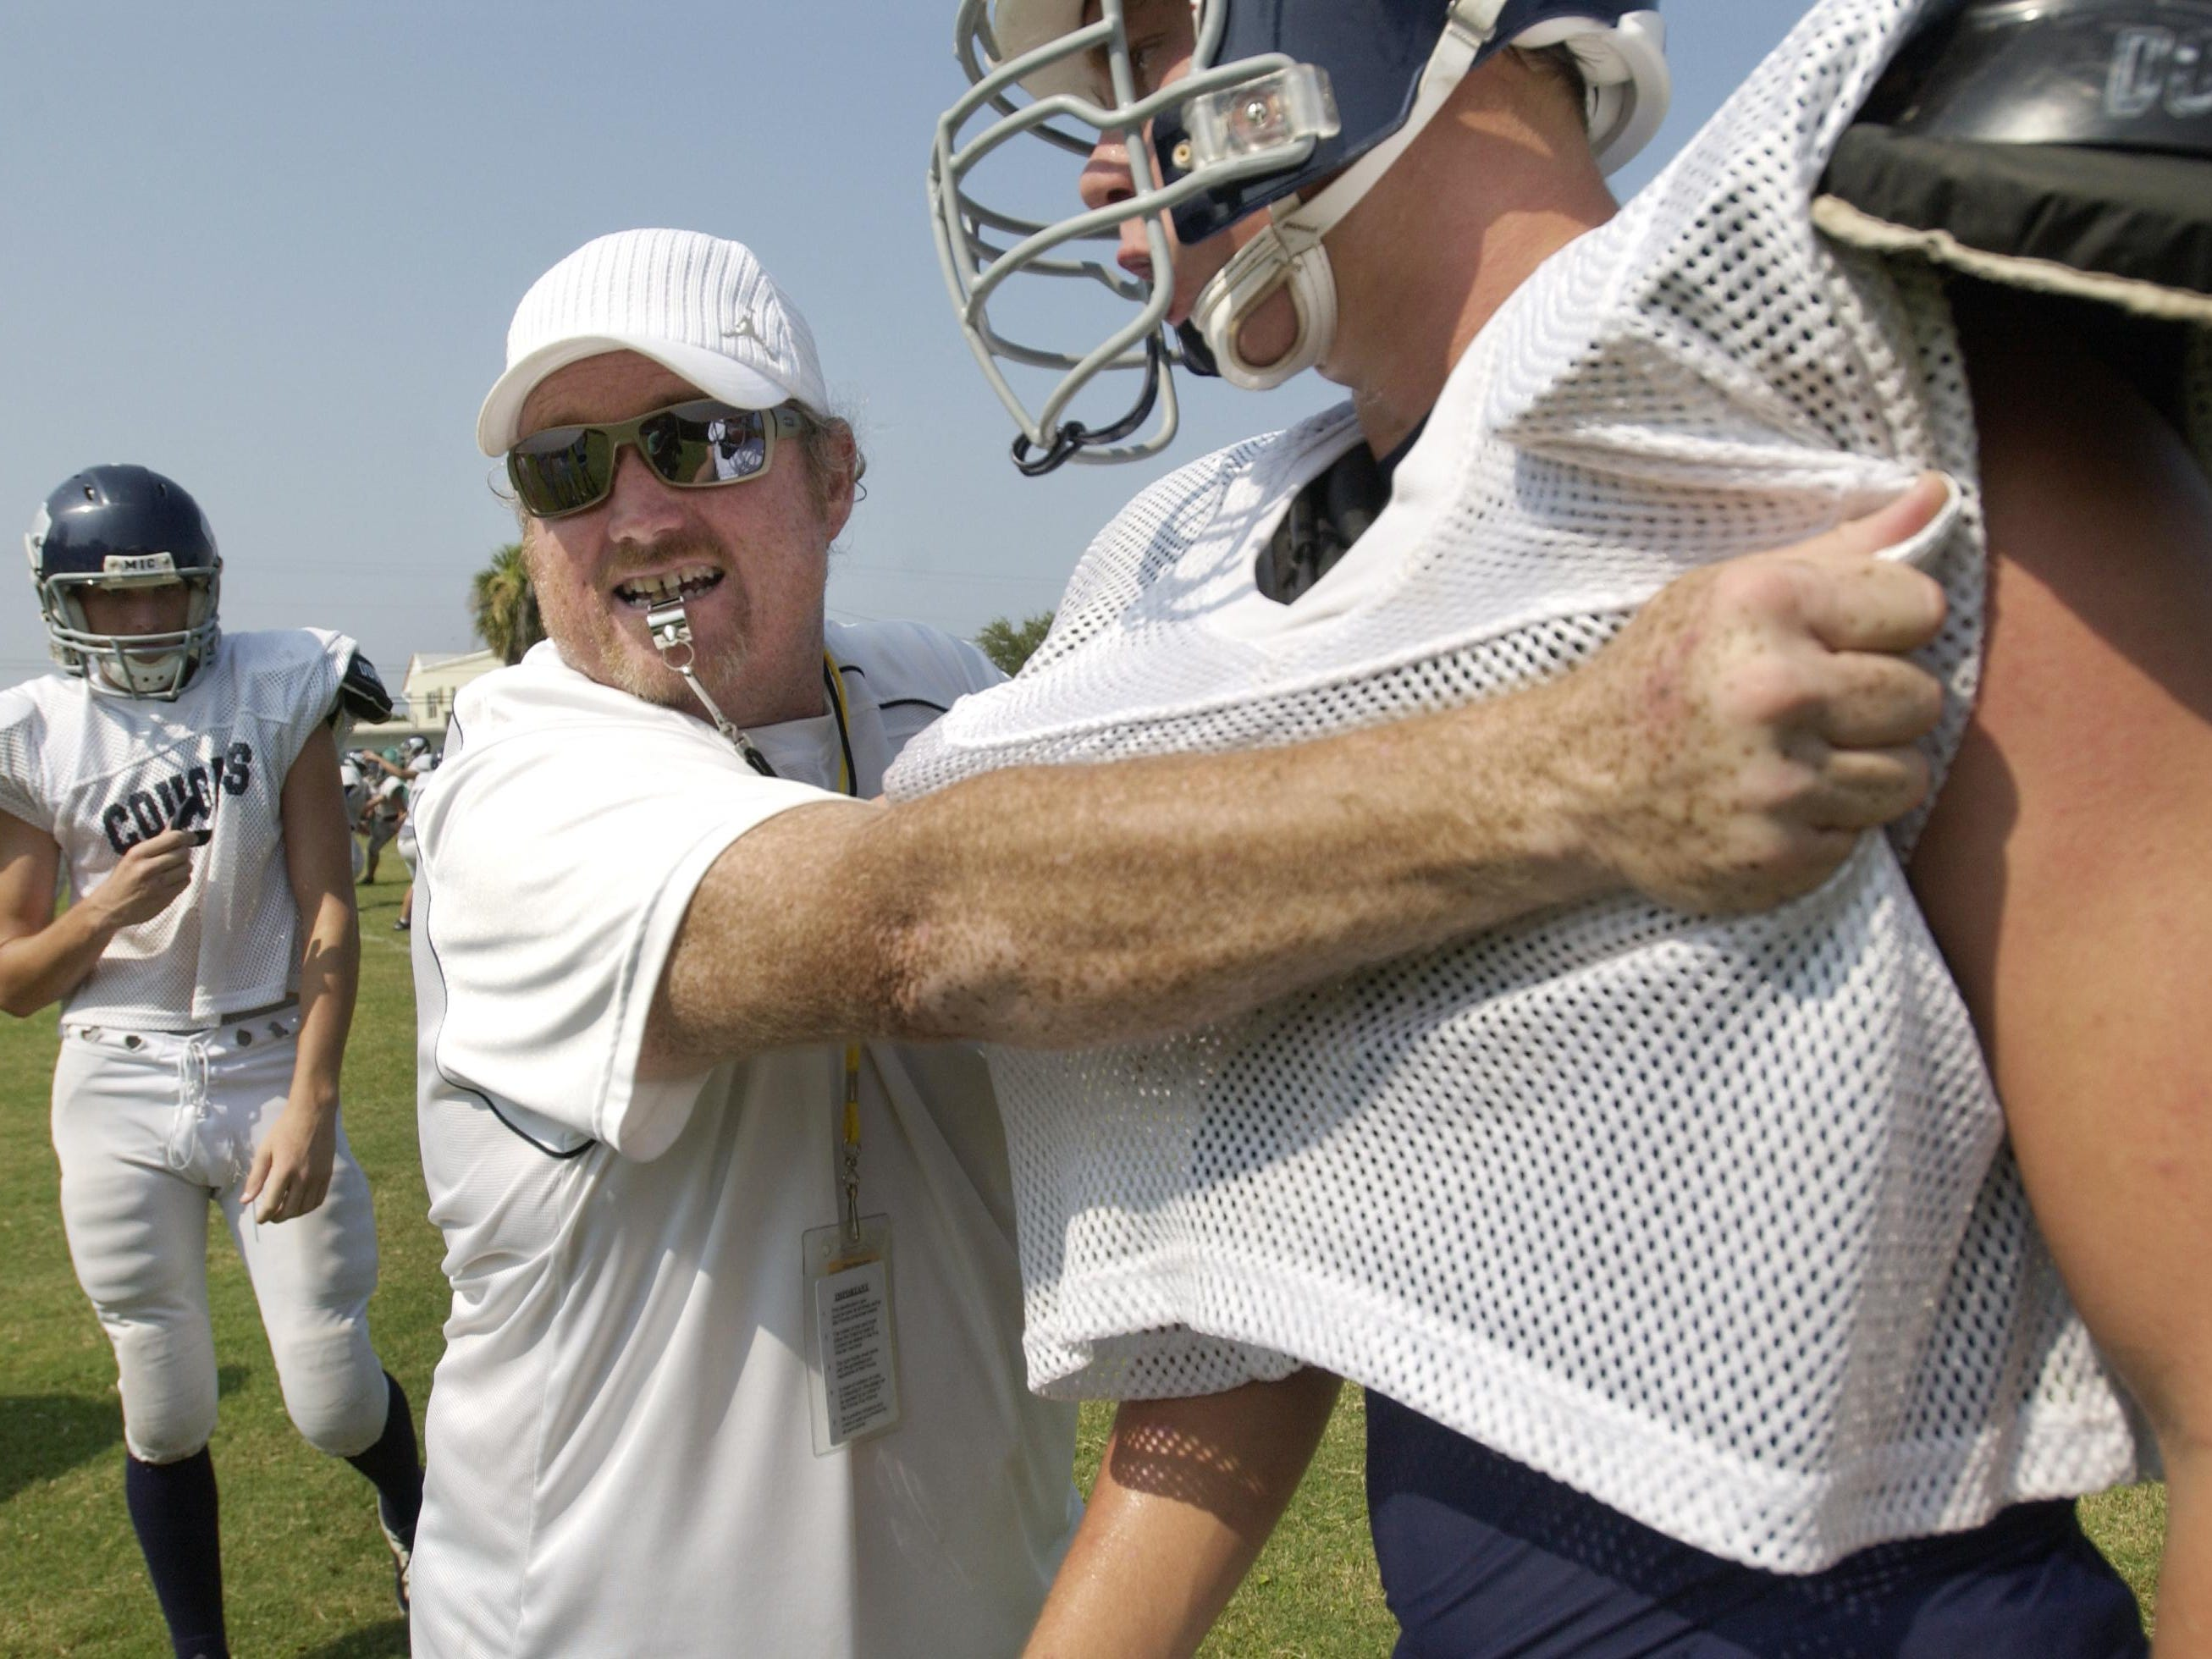 New Merritt Island Christian football coach Brian Power served as an assistant coach in 2007.